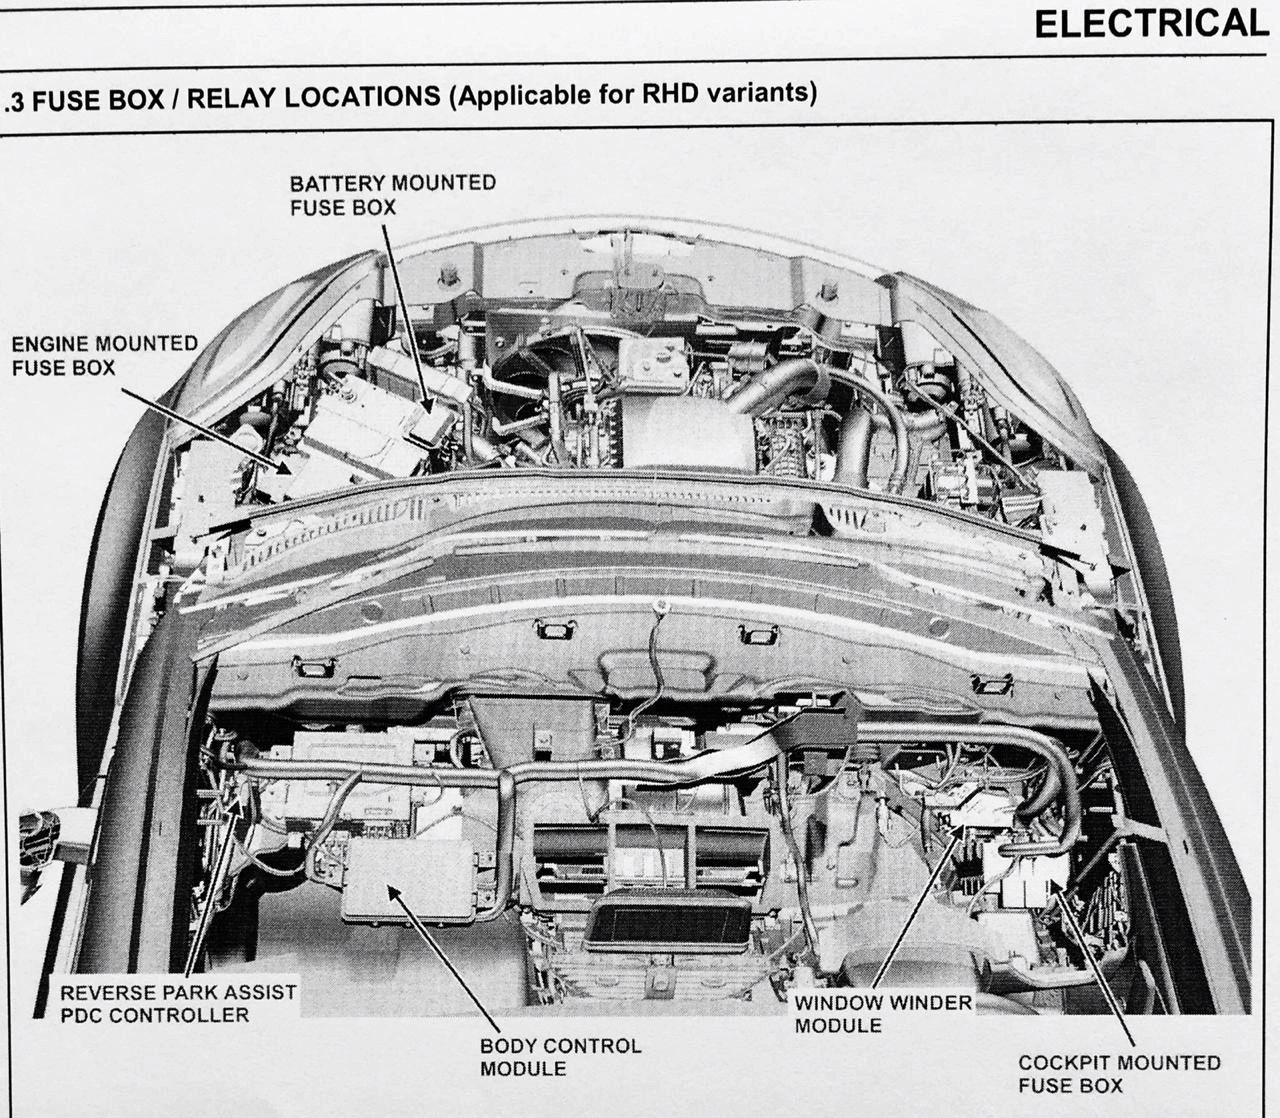 fuse box relays diy know your car fuse box relay locations fuse box restaurant oakland car fuse box relay locations